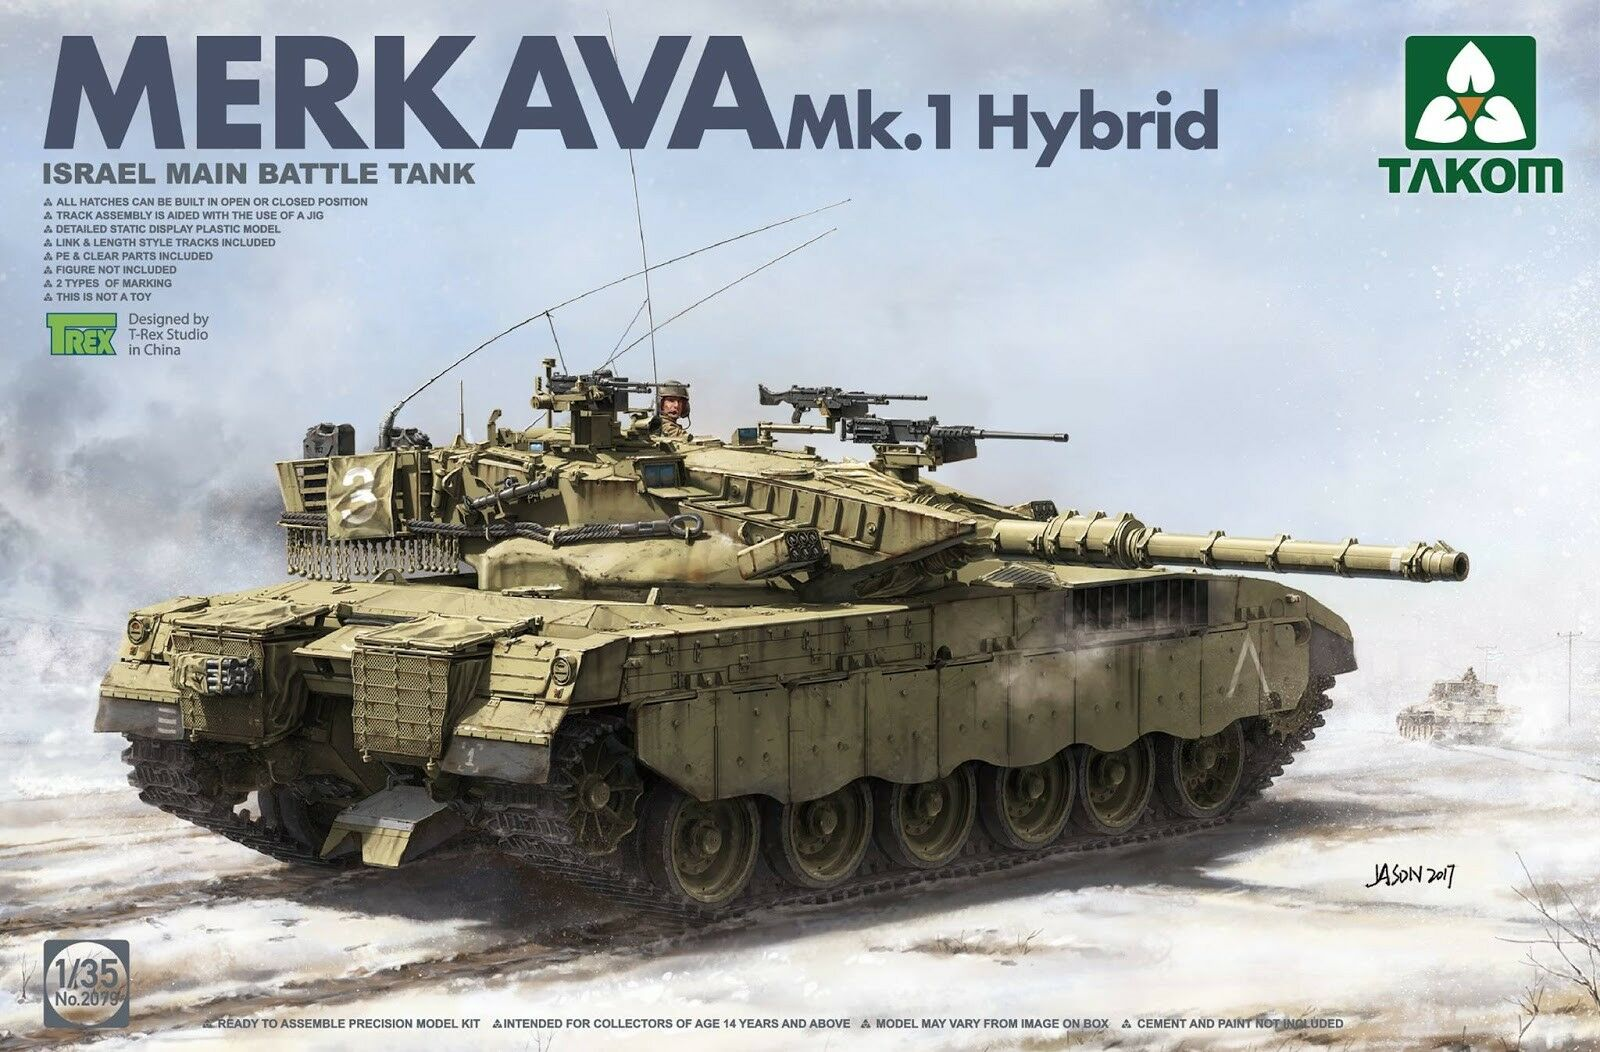 Thanksgiving et l'amour Israélien Main Bataille Bataille Bataille Réservoir Merkava 1 Hybrid 1/35 Takom | Online Store  934daa